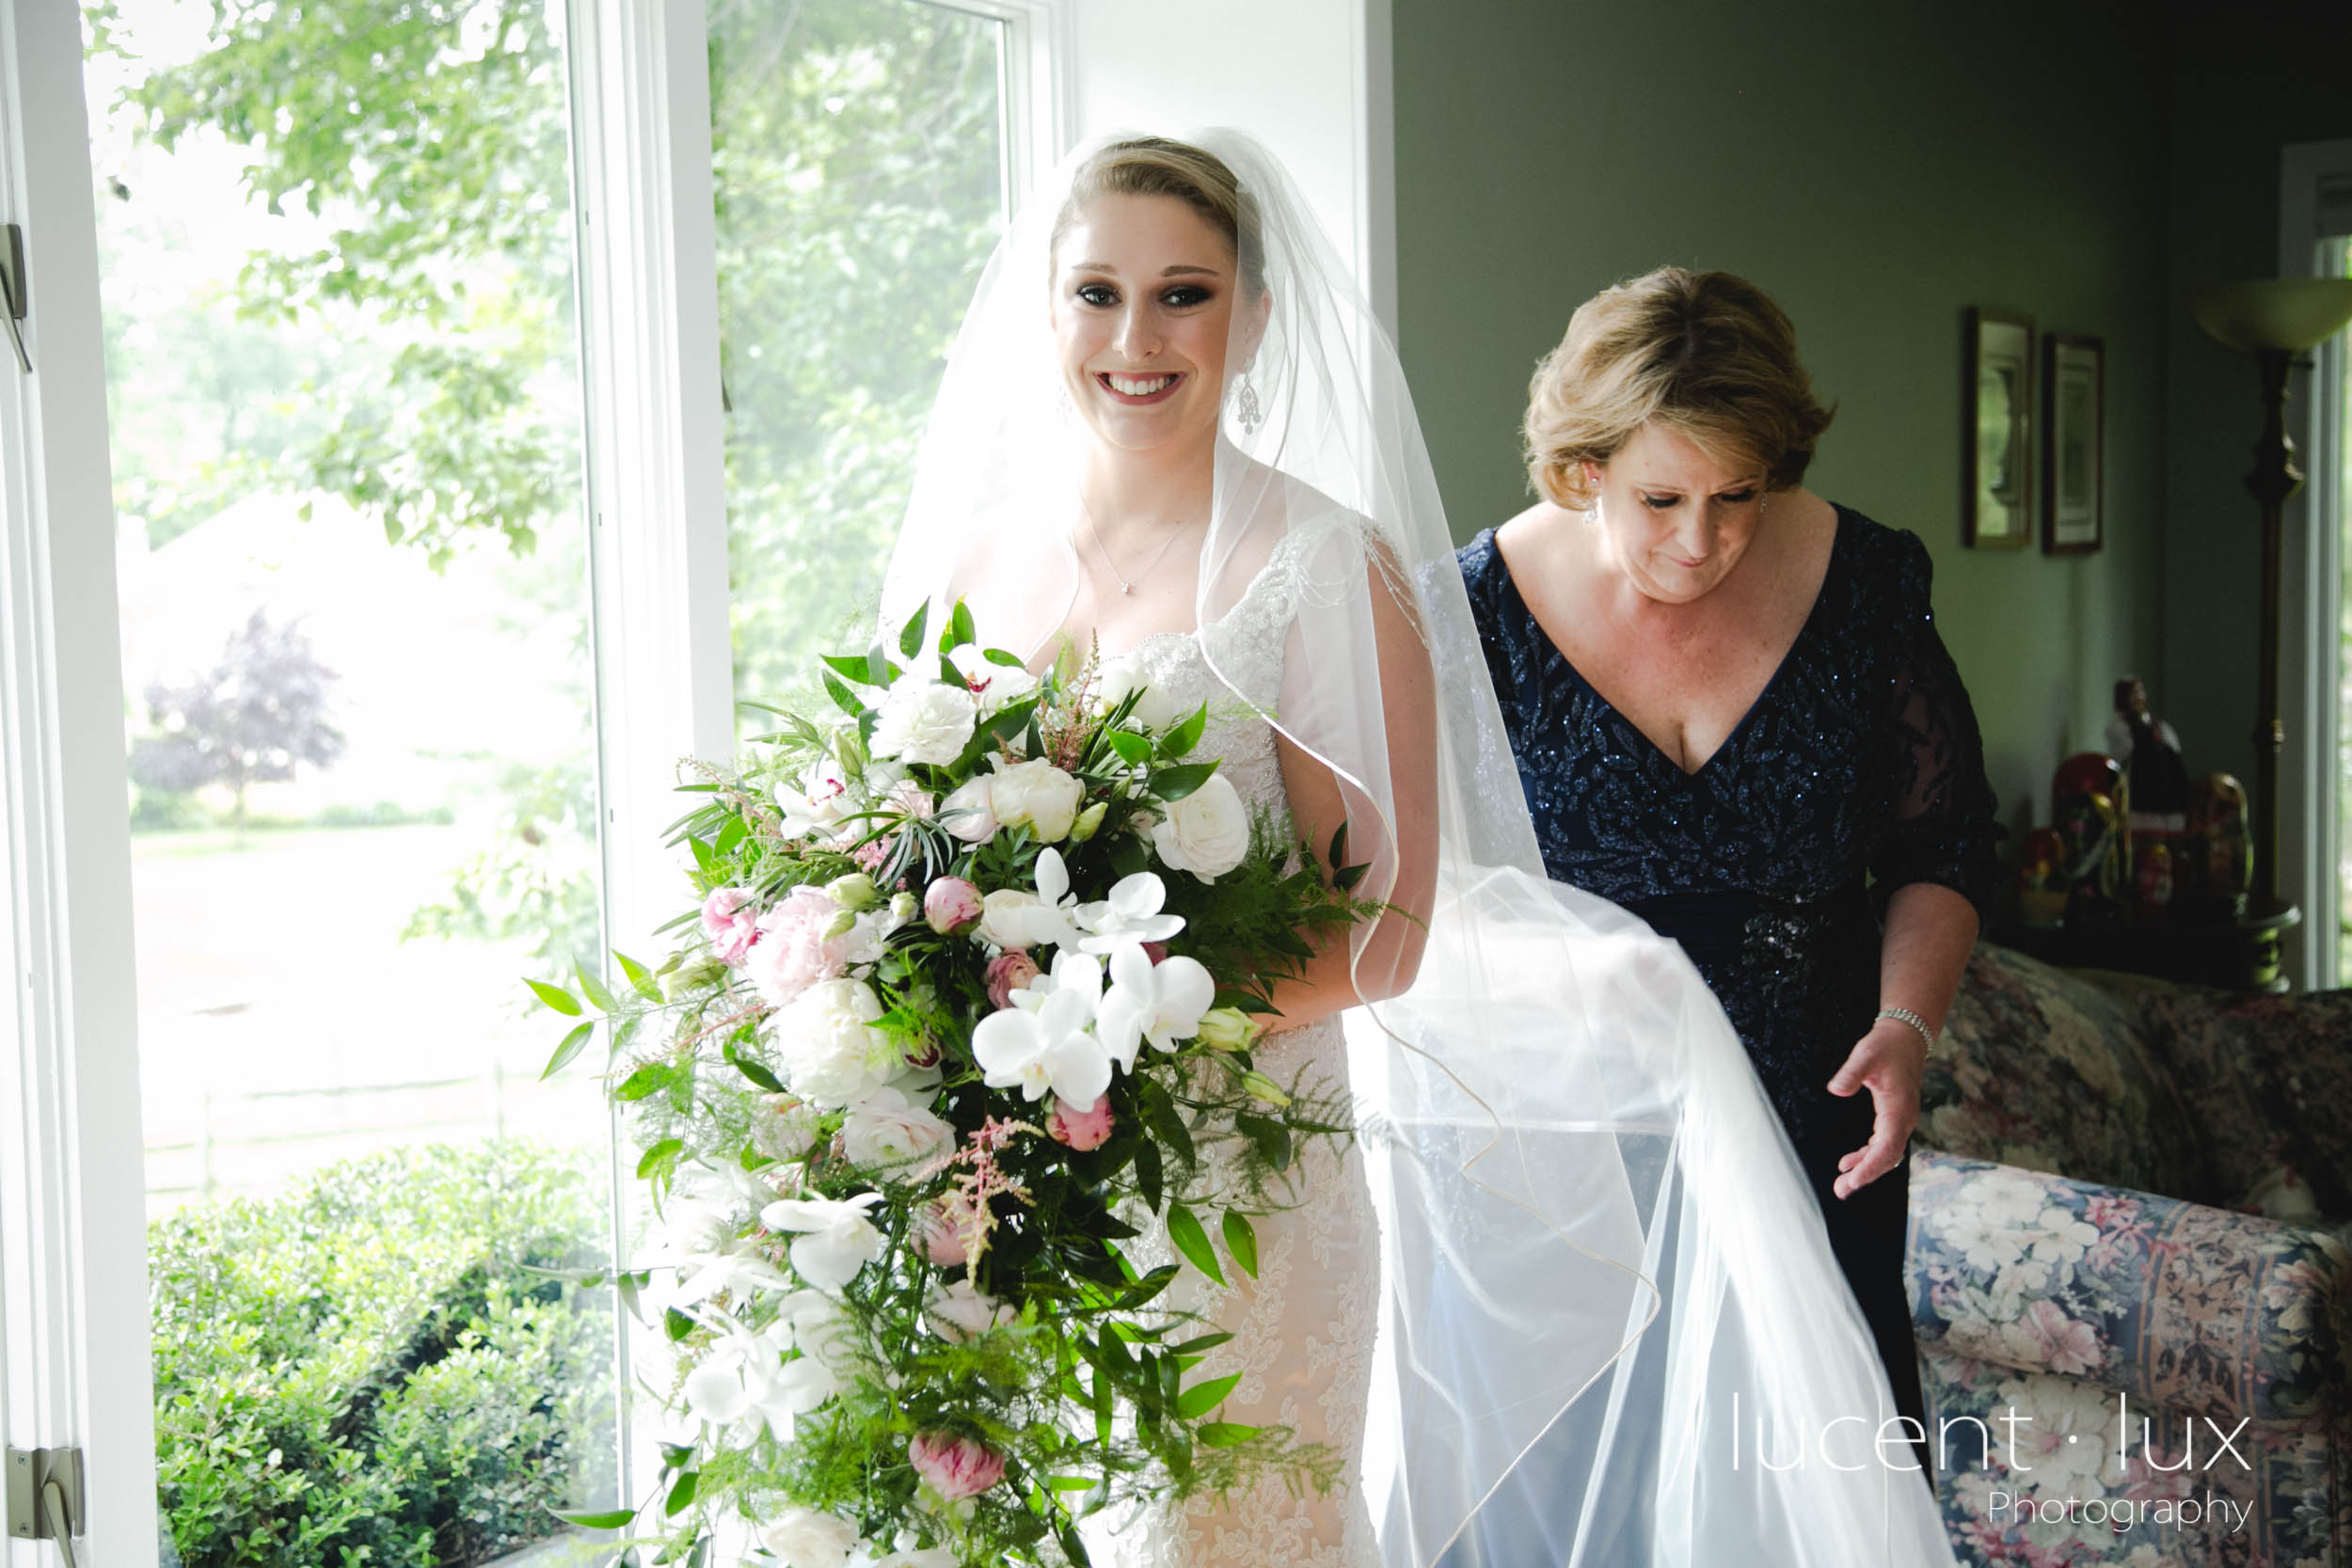 Wedding-Photography-Maryland-Pennsylvania-Photographer-Mendenhall-Inn-Media-Portrait-Event-109.jpg